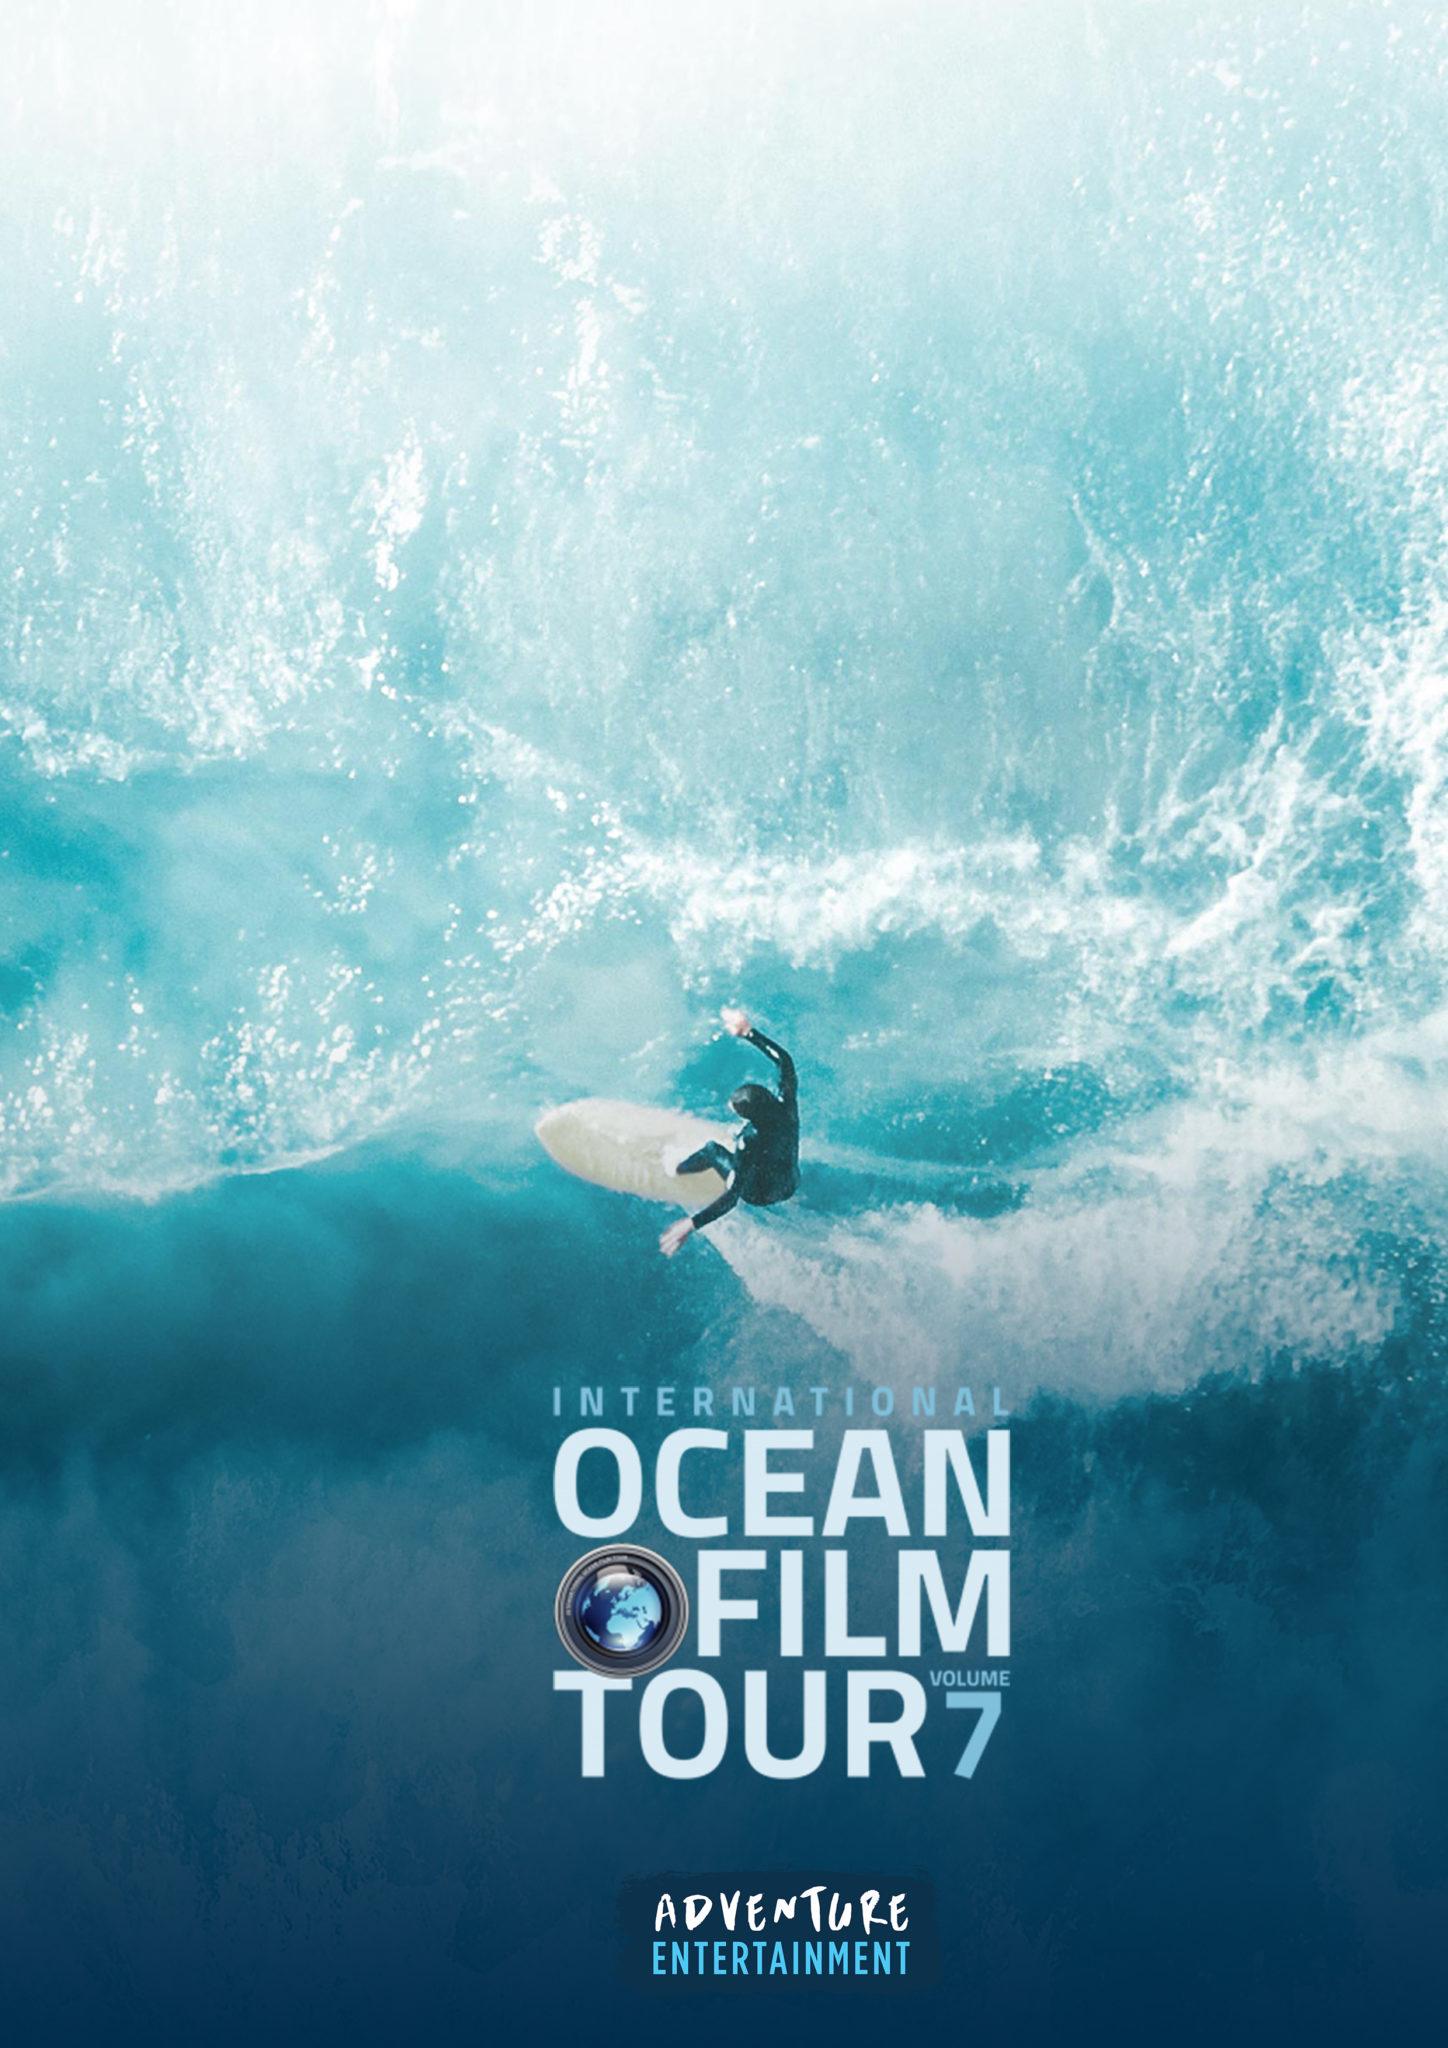 INTERNATIONAL OCEAN FILM TOUR- VOL 7